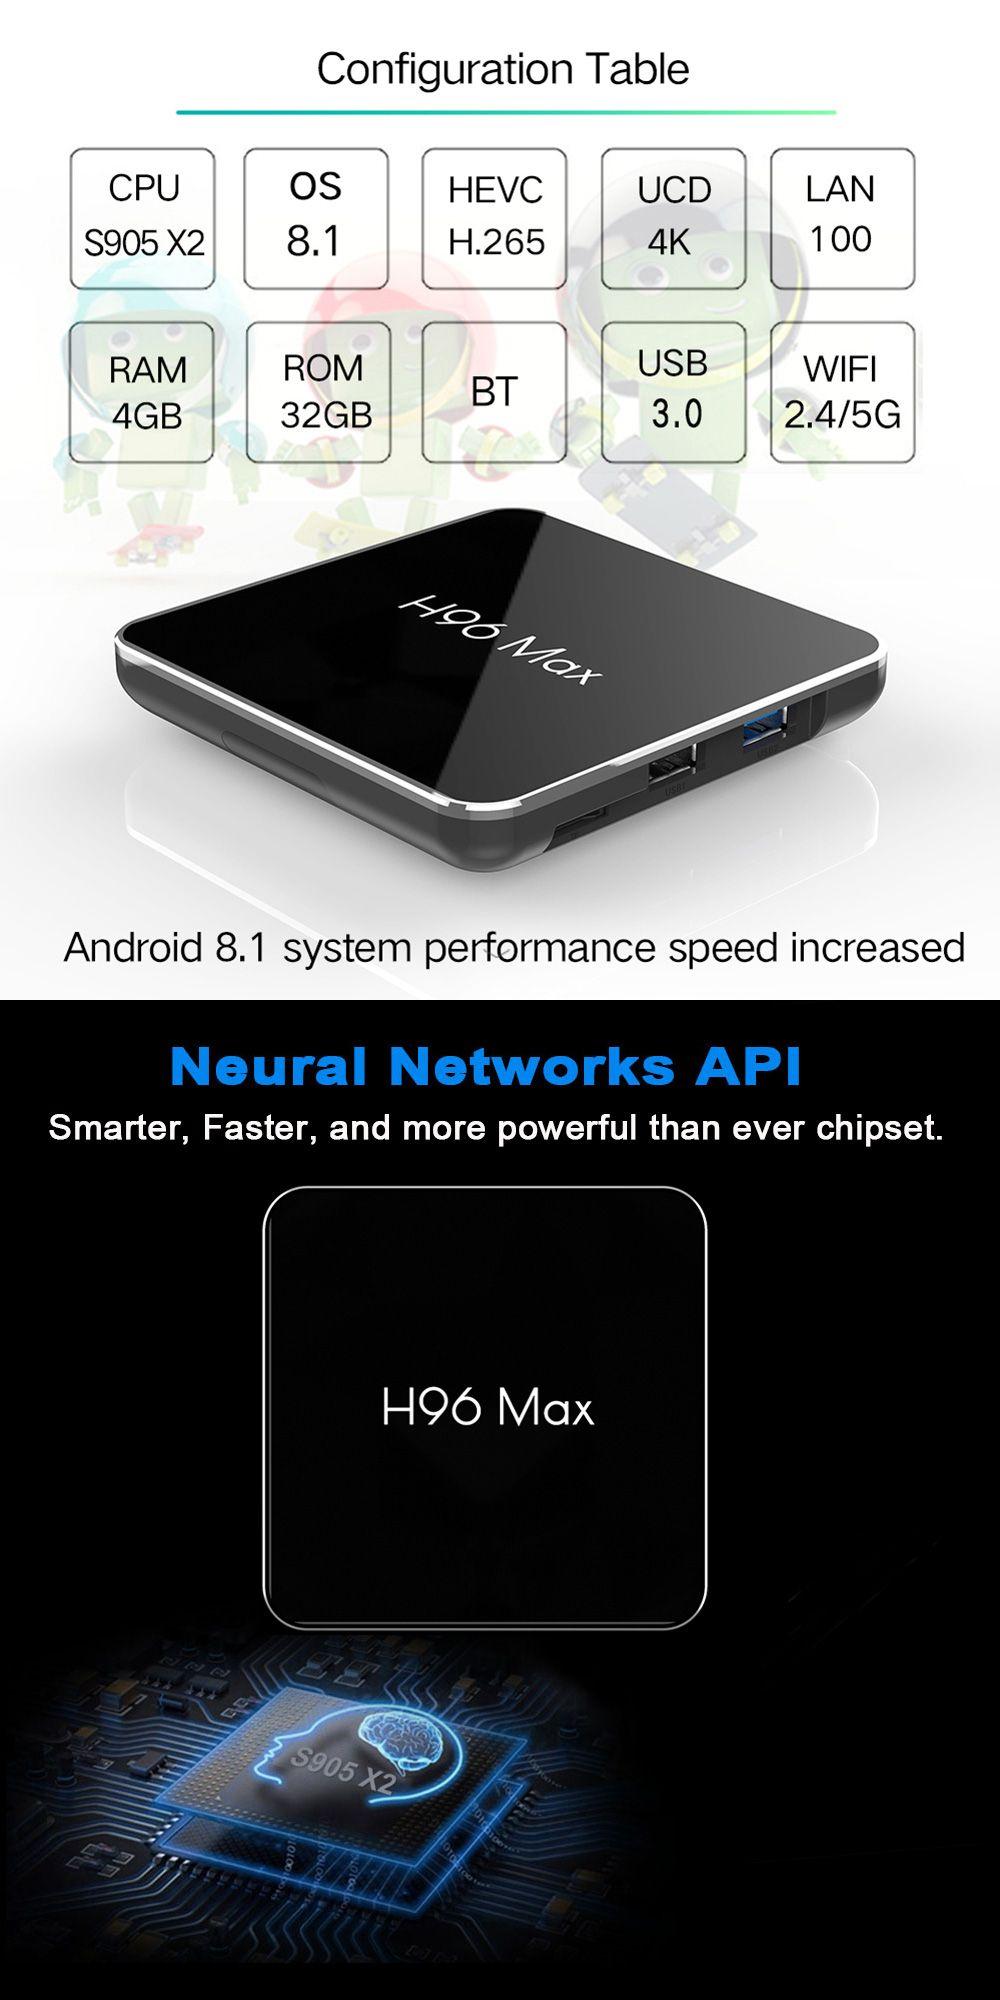 H96 Max X2 S905X2 4GB DDR4 RAM 32GB ROM Android 8 1 5G WiFi USB3 0